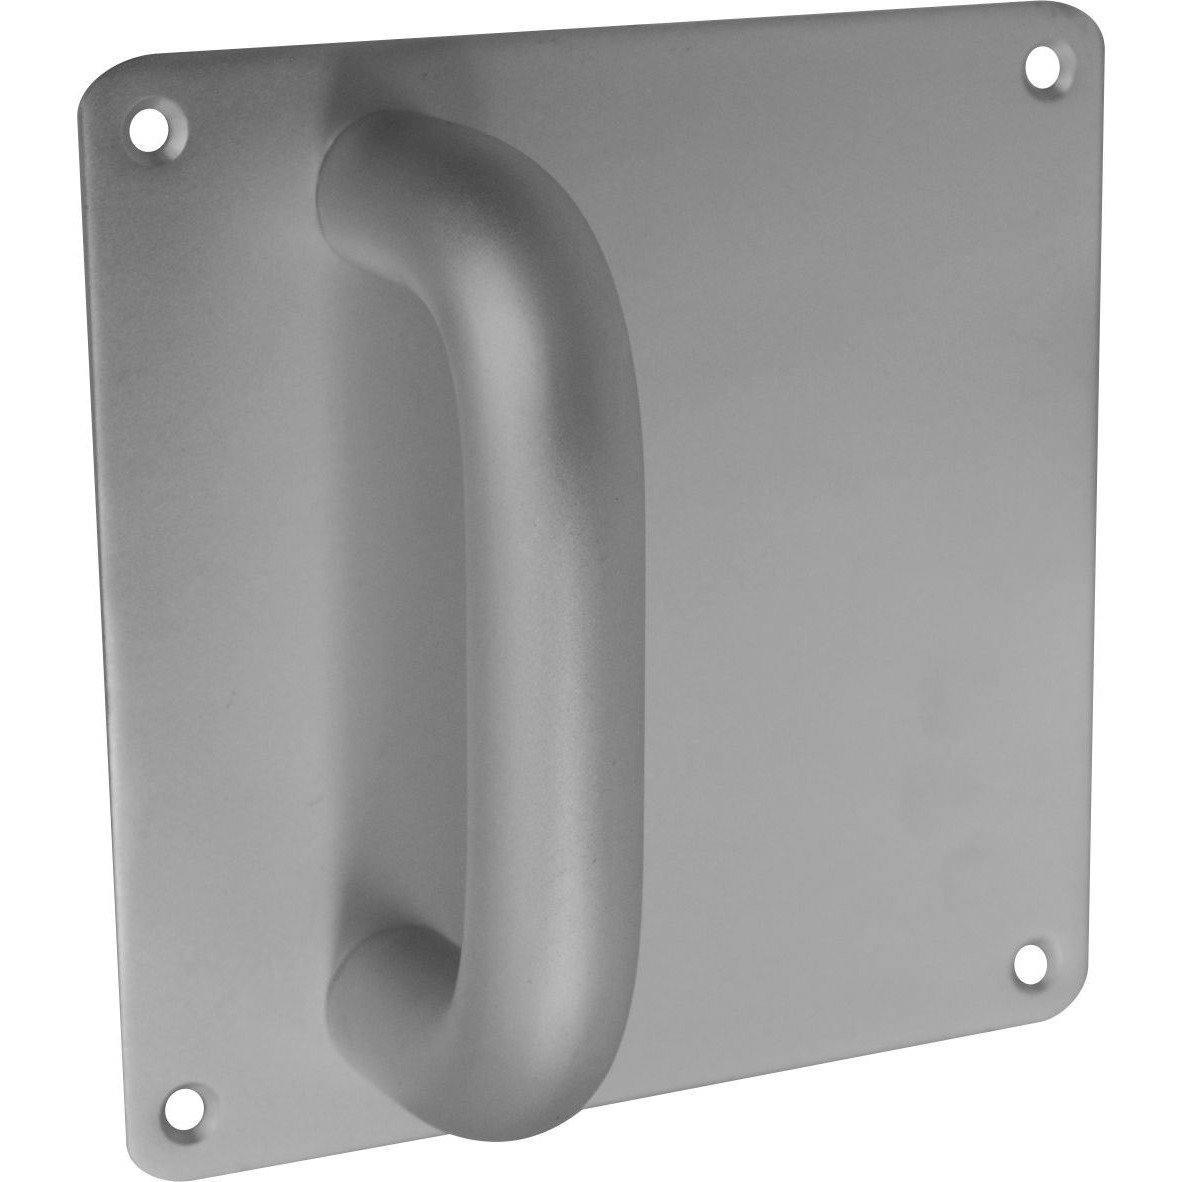 Aluminium Door Handles on Plate - 150 X 150mm - Pull Handle